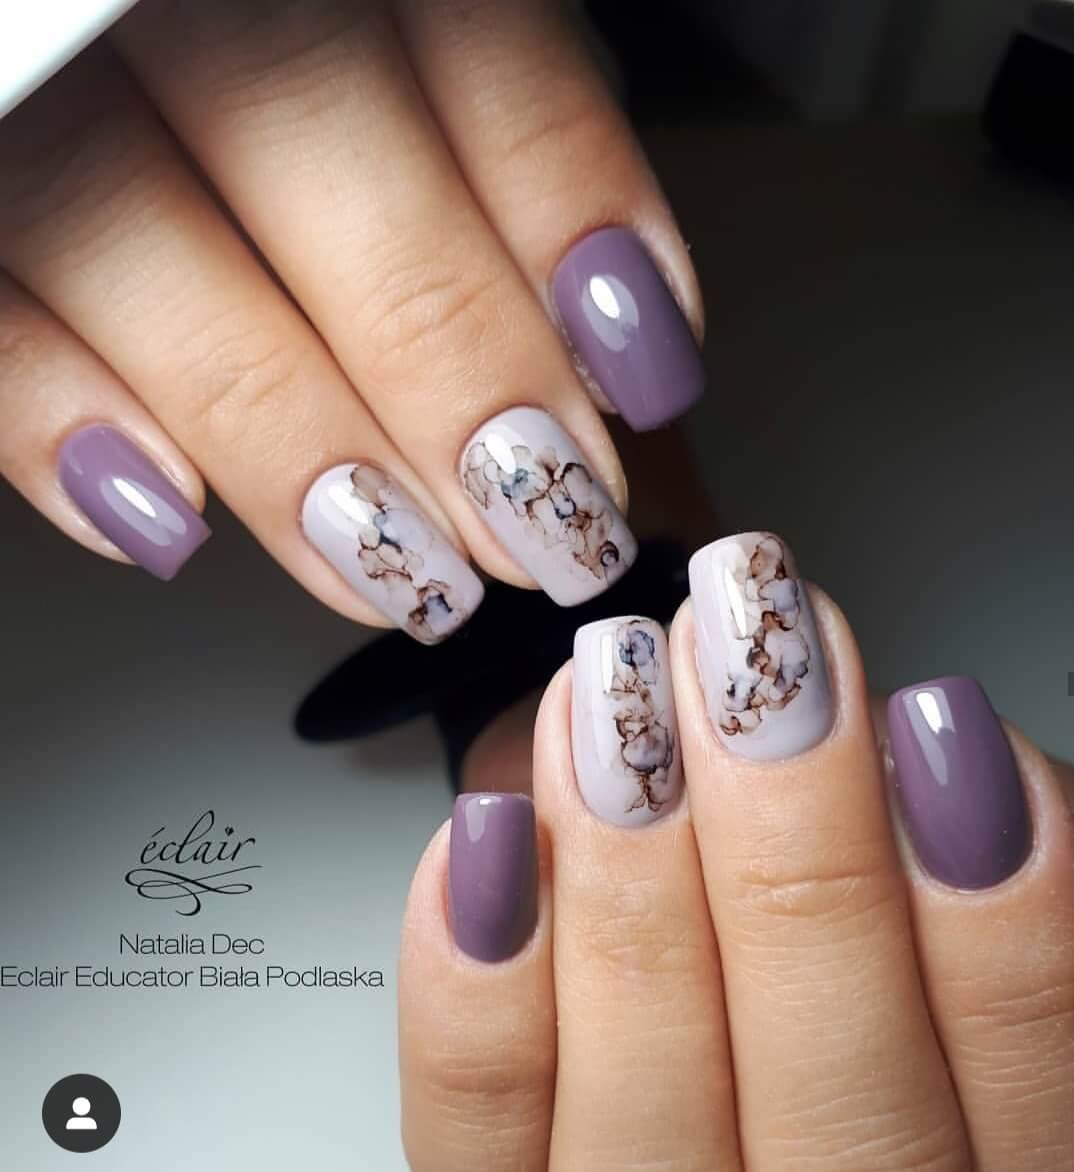 Manicure Biała Podlaska